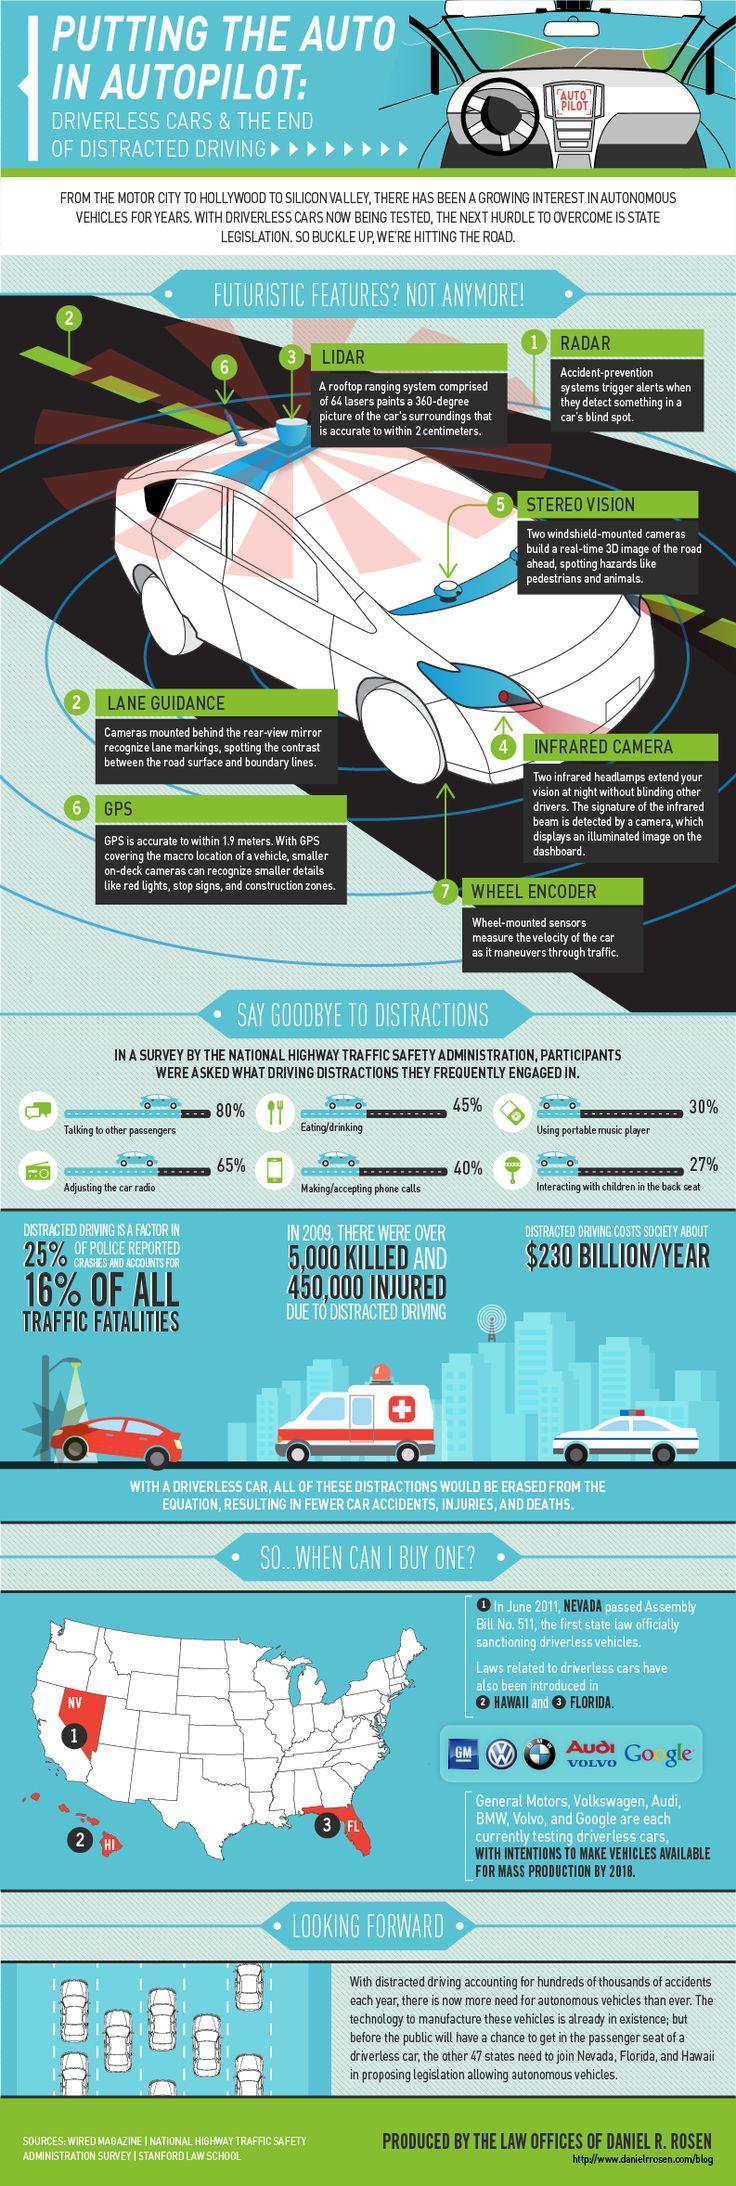 Likely cars of the future likely cars of the future http www - Likely Cars Of The Future Likely Cars Of The Future Http Www 23